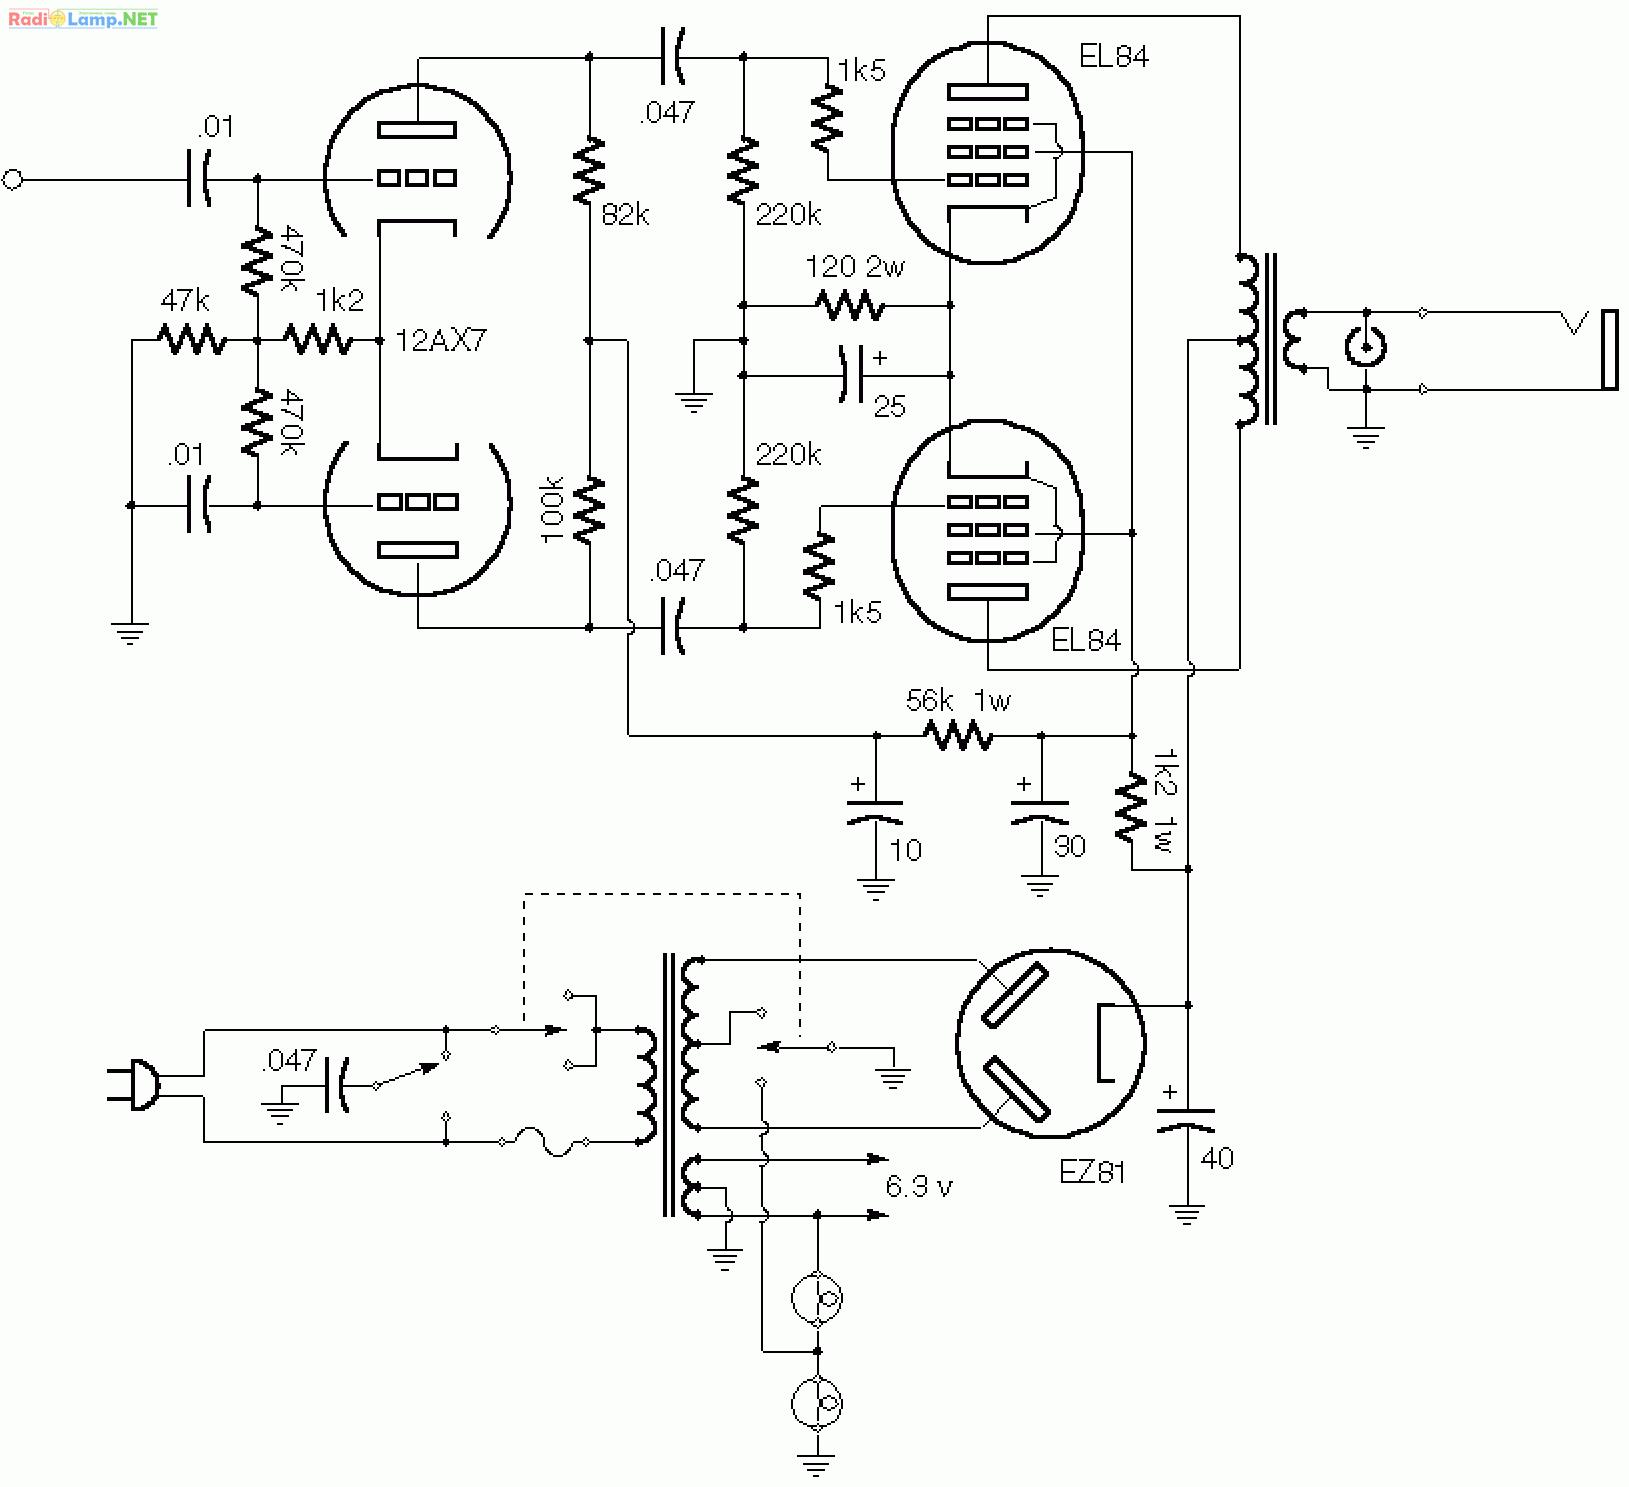 vox berkeley power amp